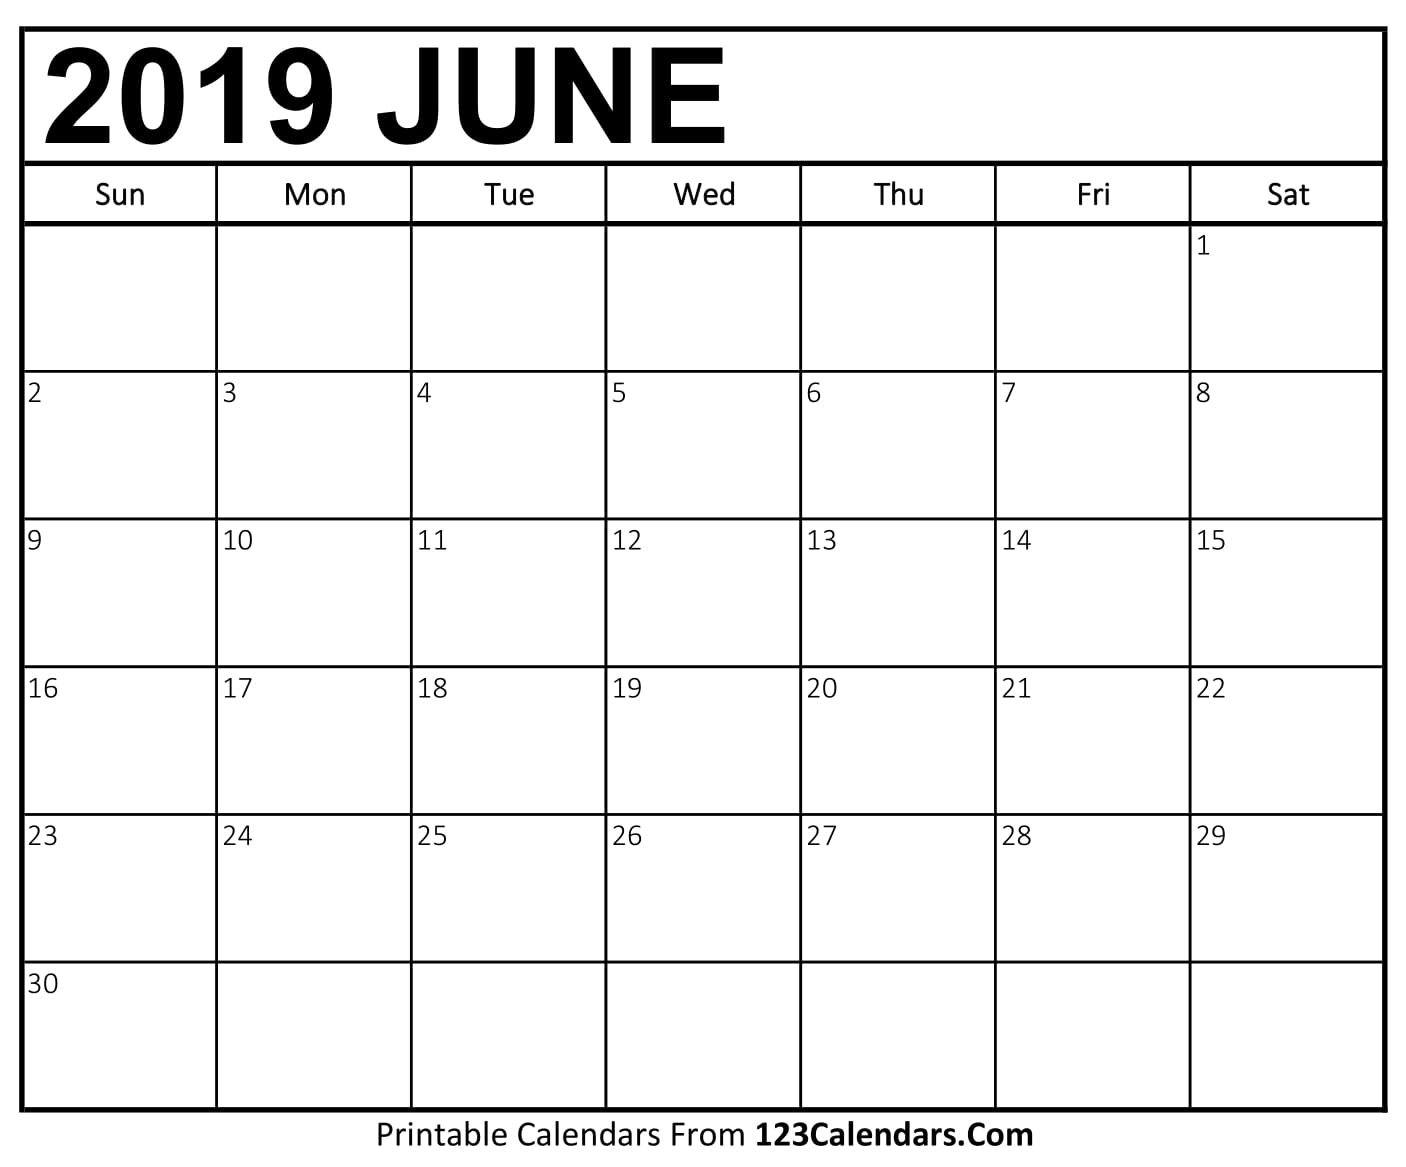 June 2019 Calendar Blank Easily Printable 123calendars